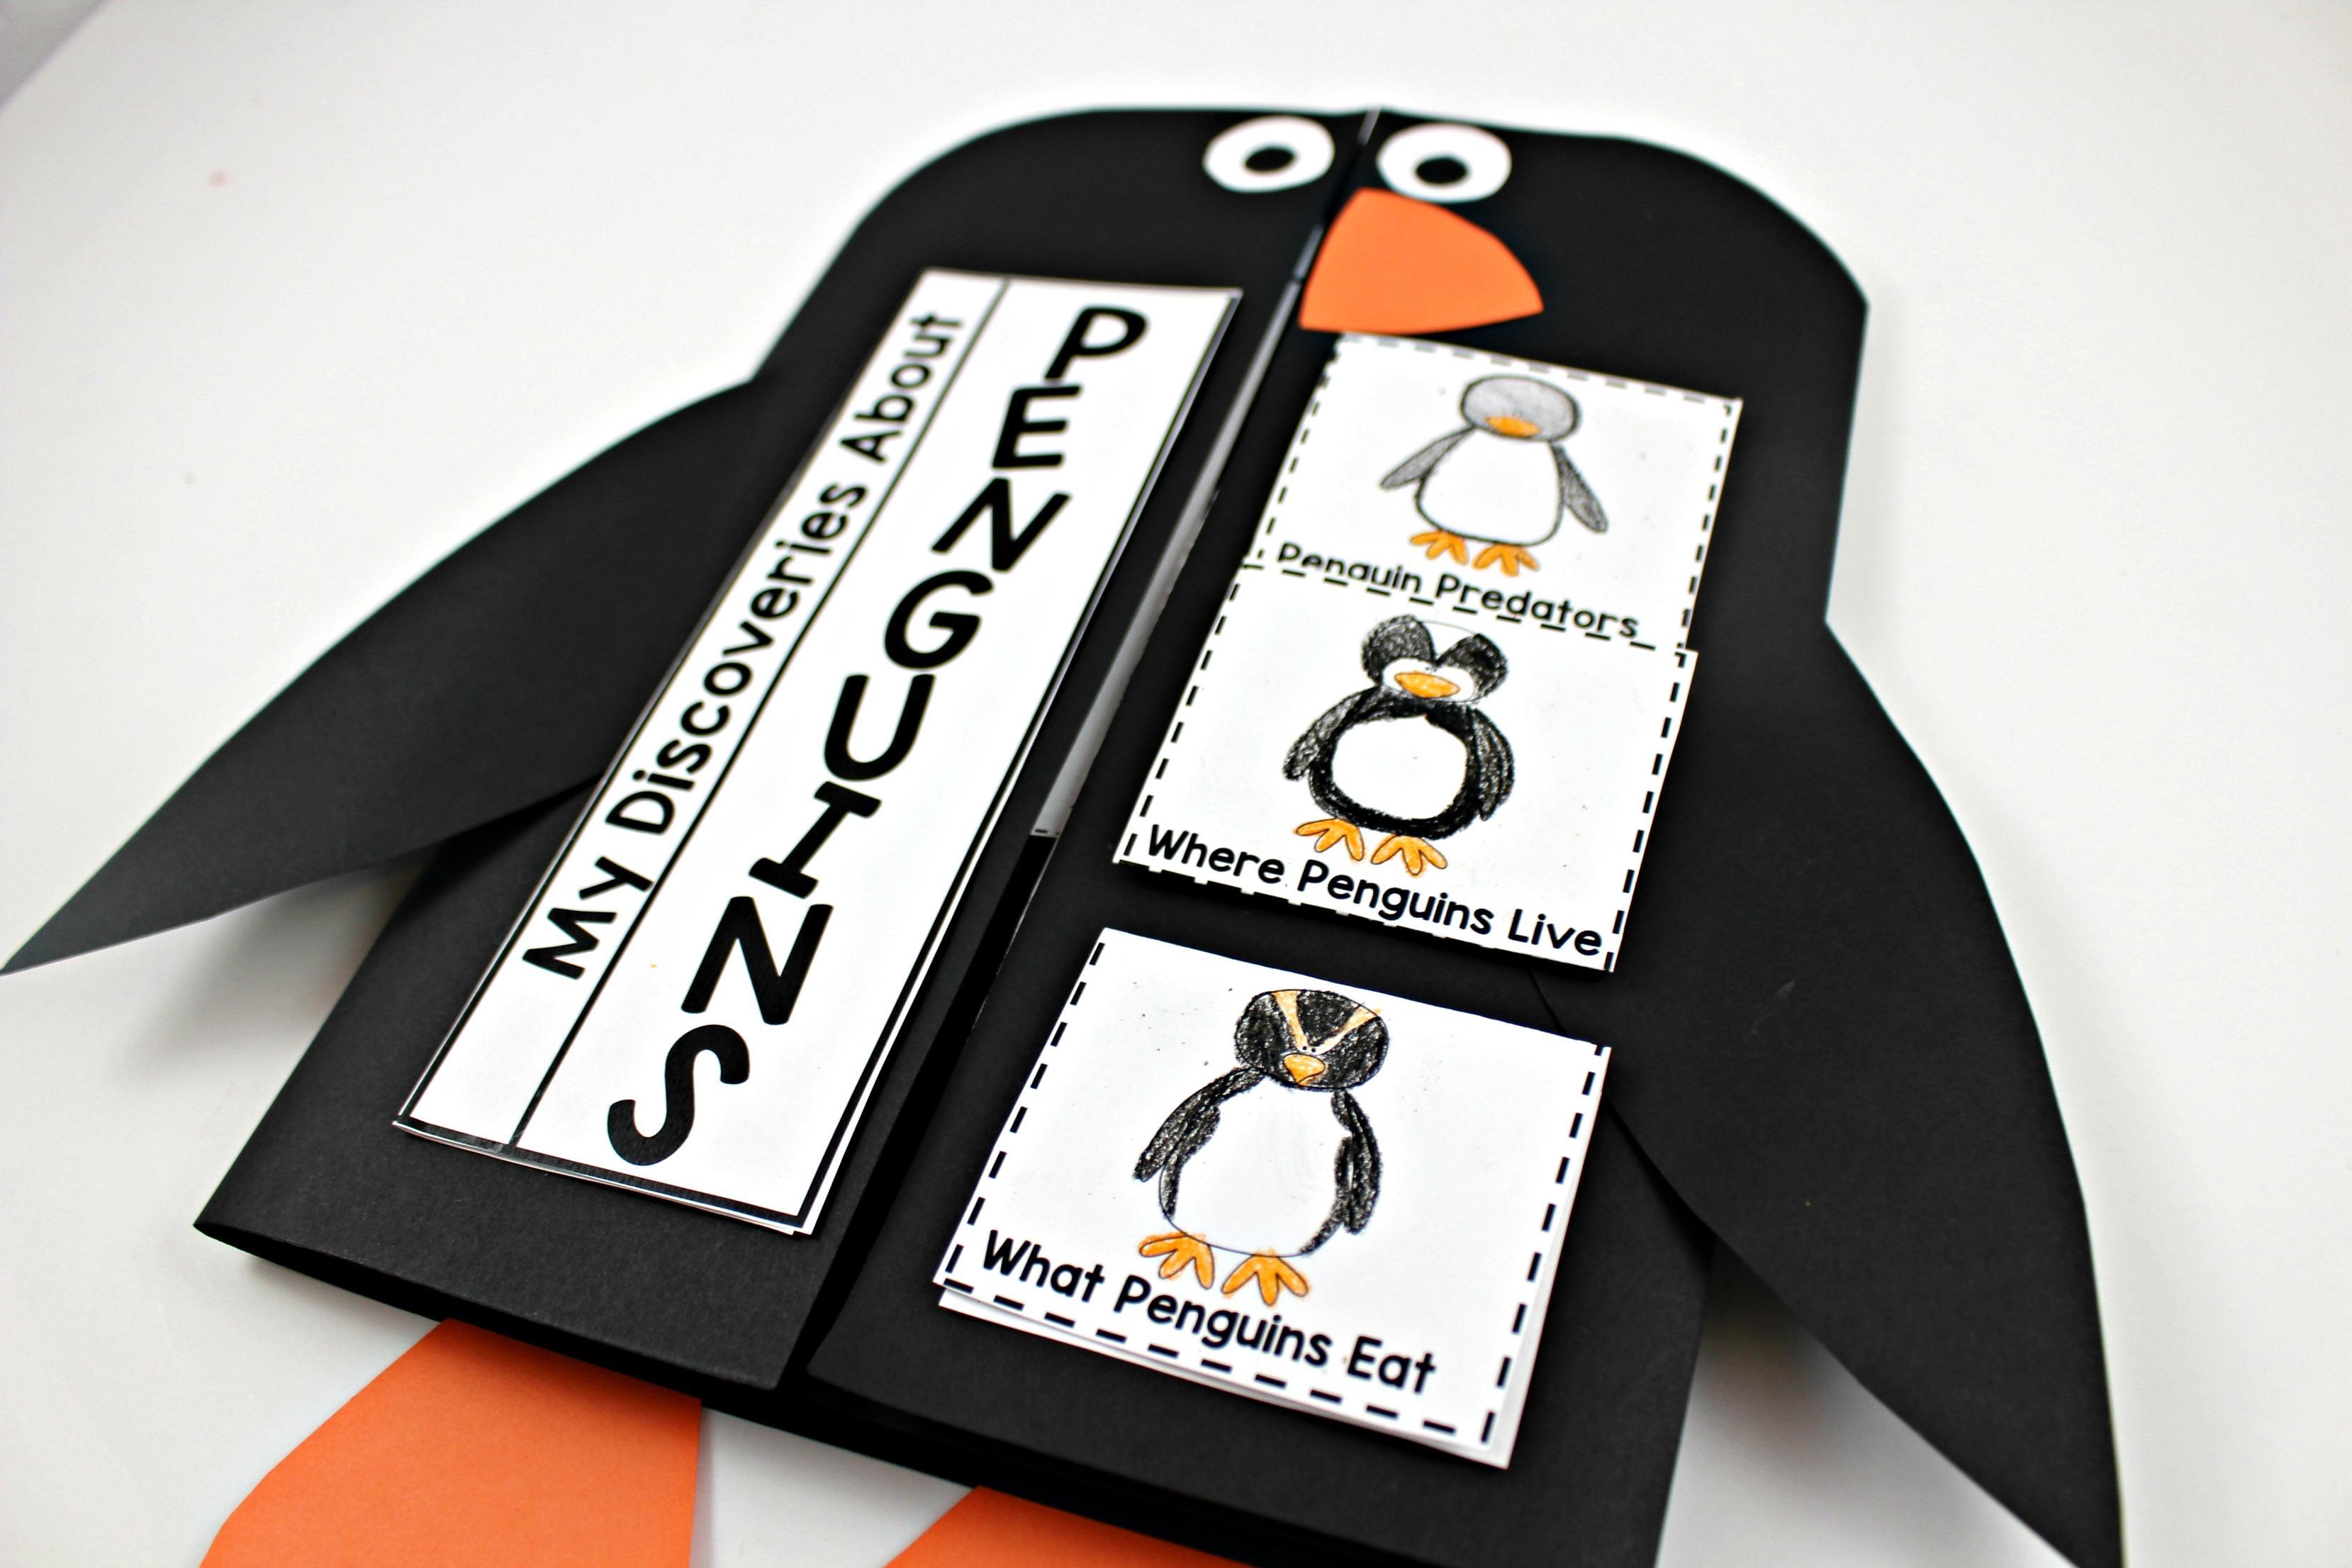 Penguin Activities For 2nd Grade